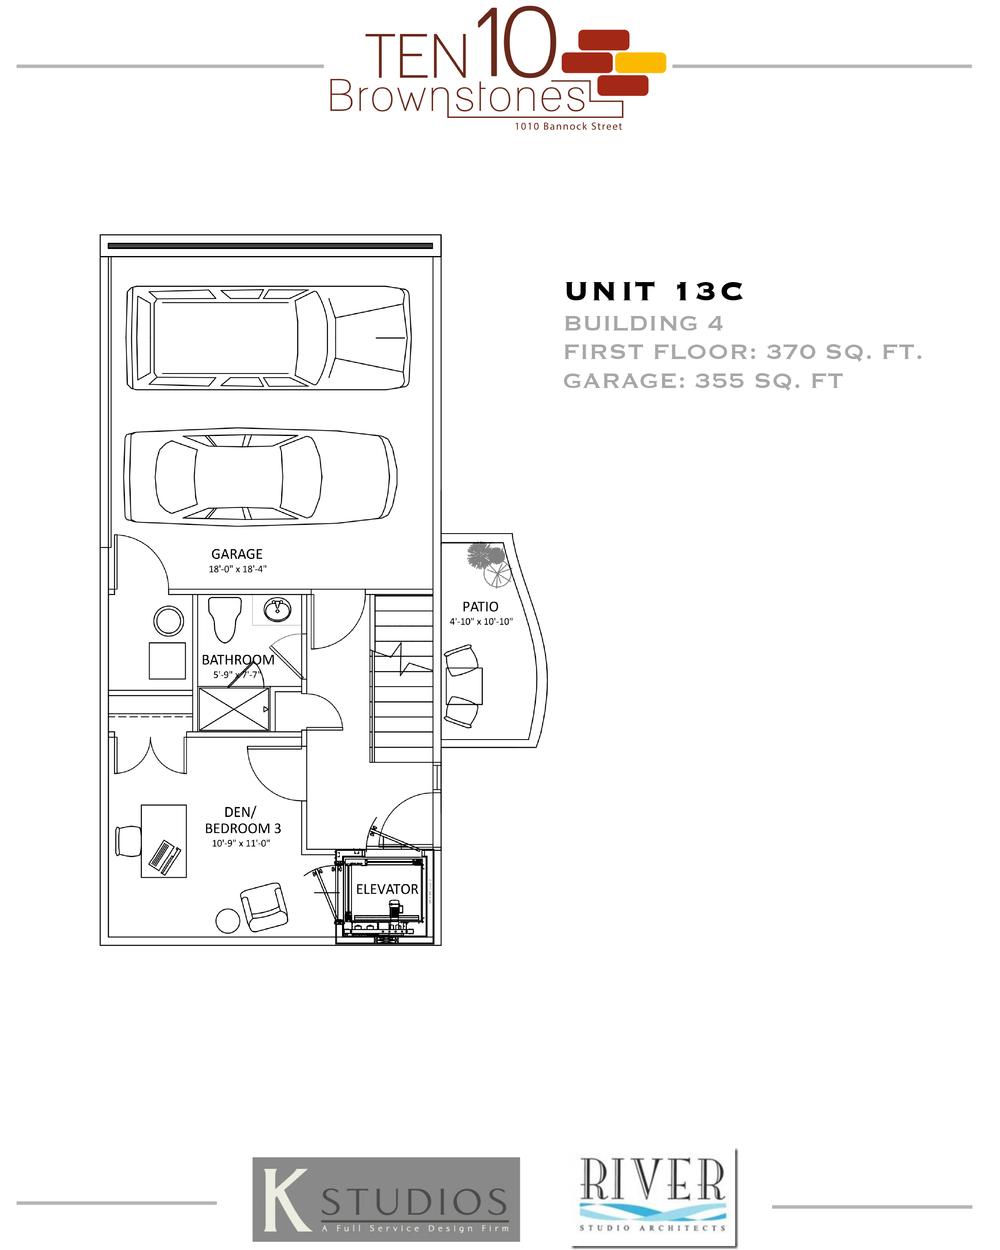 Click image to view & download Unit 13C floor plan